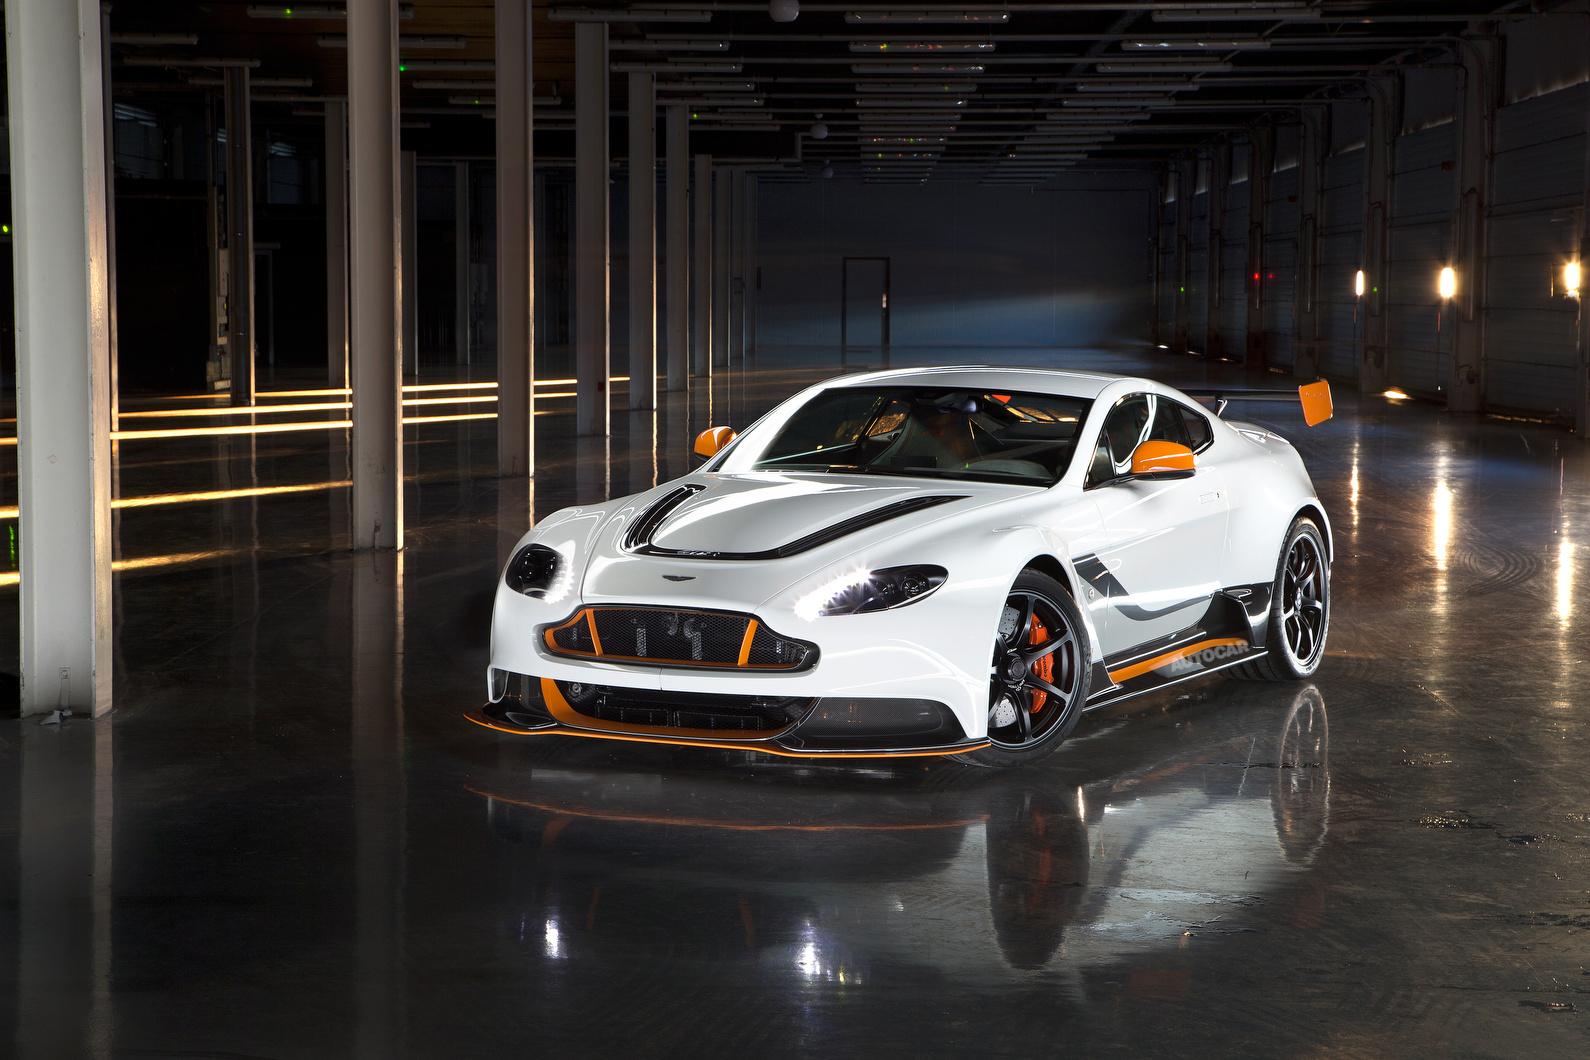 2015 Aston Martin Vantage Gt3 Revealed